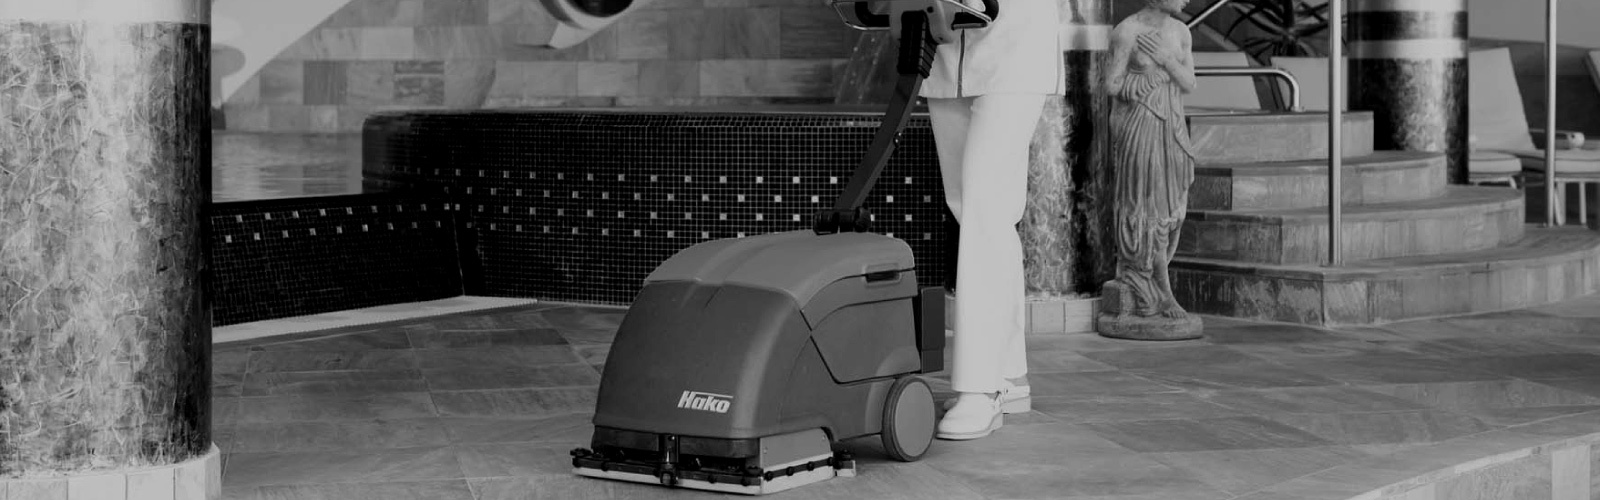 Scrubmaster B3 Flexible walk-behind scrubber-drier